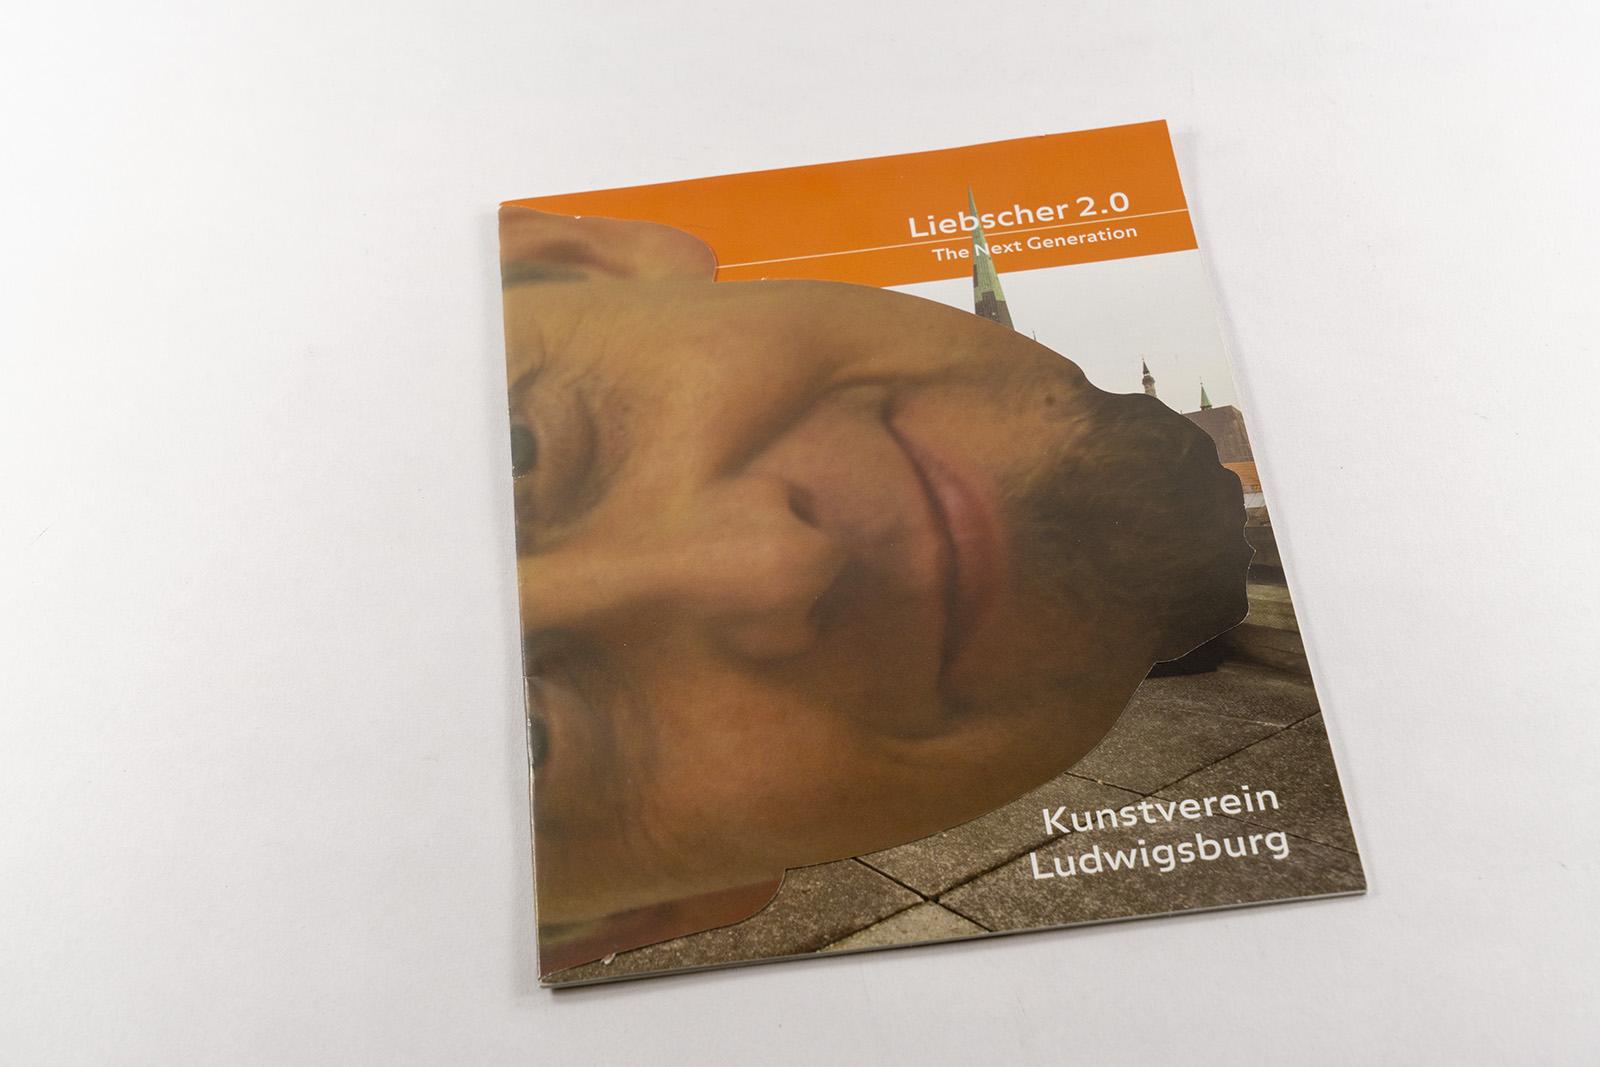 2001_Liebscher_2_0_01